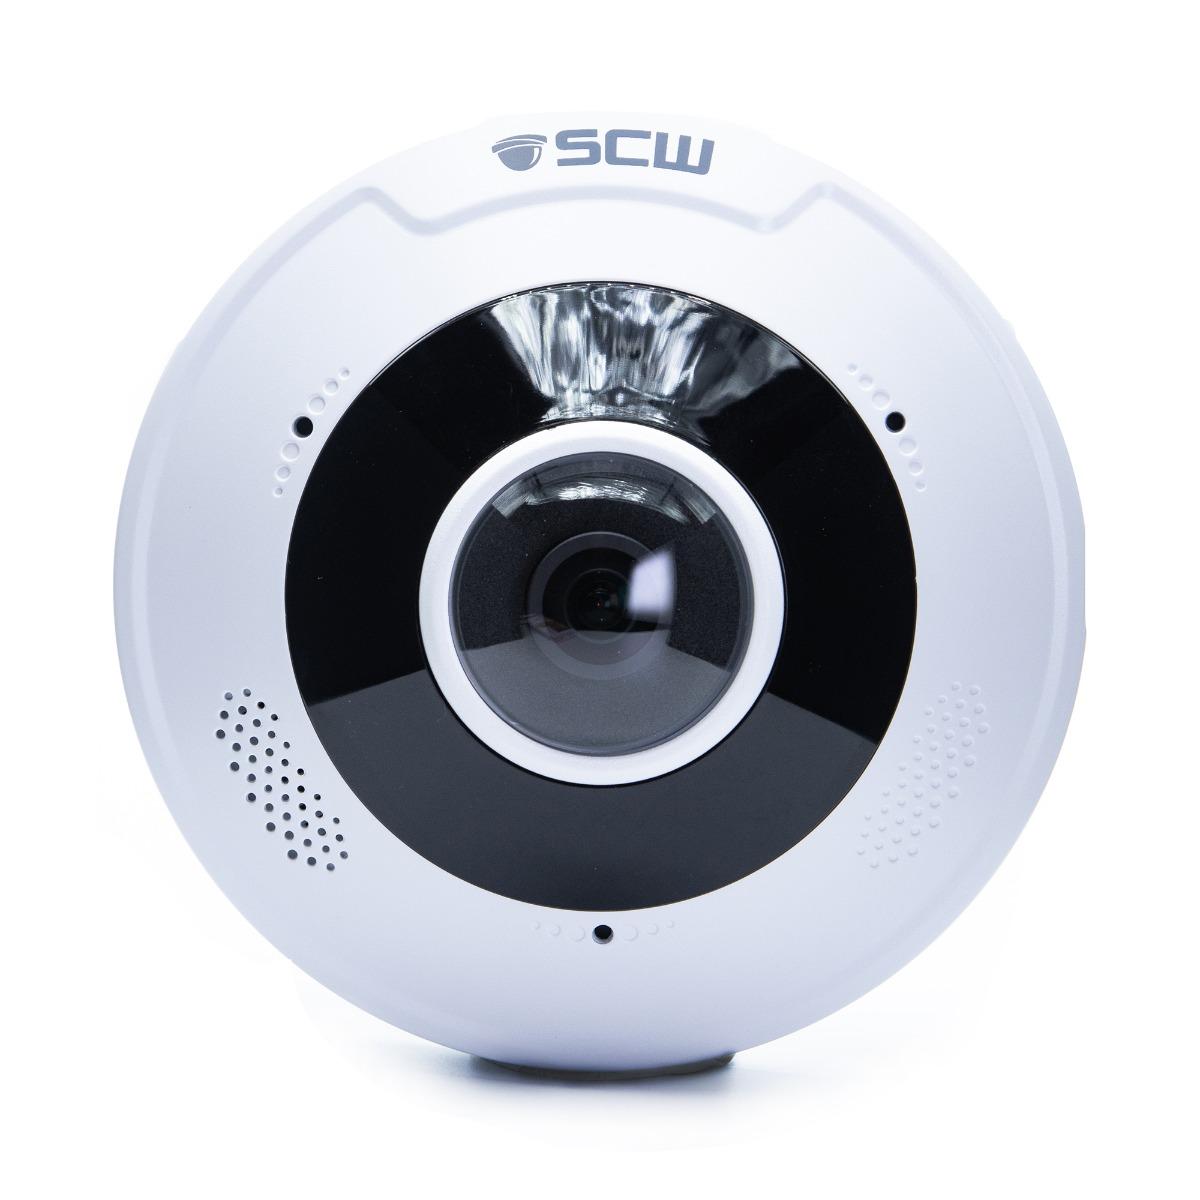 The Radius 12.0 - 26P12 - 12MP 360° Fisheye Dome Camera